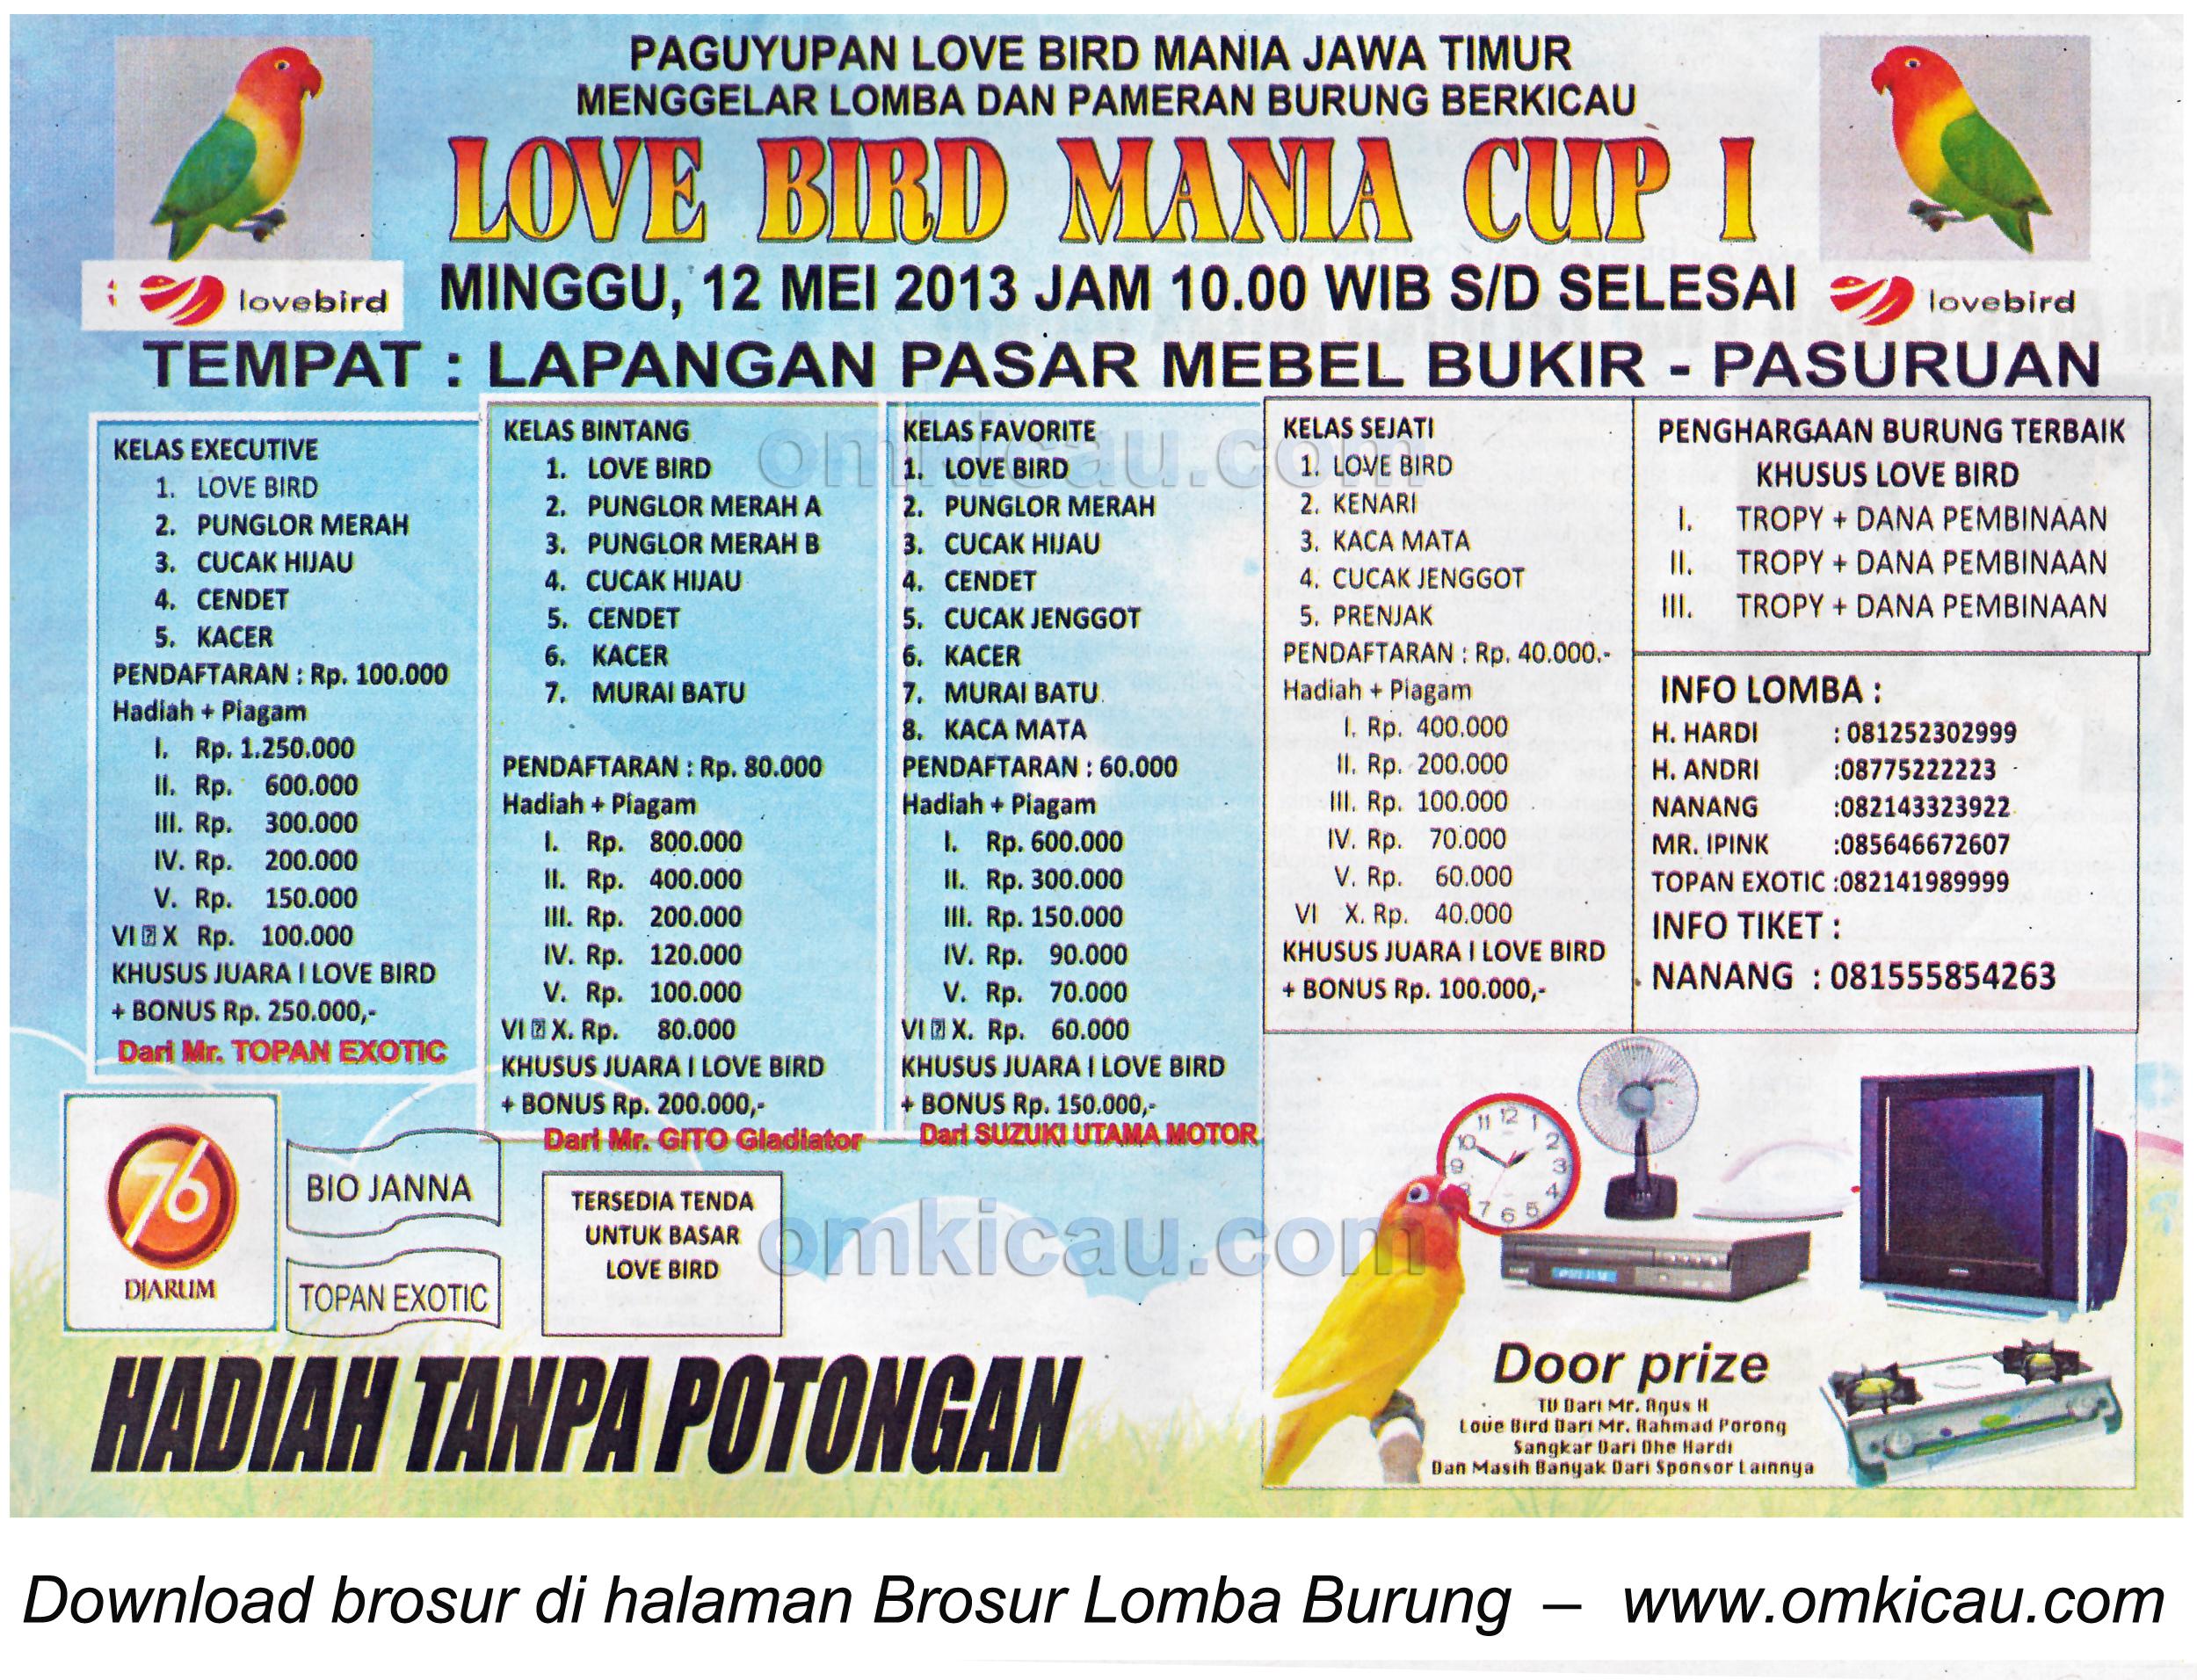 Brosur Lomba Burung Lovebird Mania Cup I - Pasuruan - 12 Mei 2013